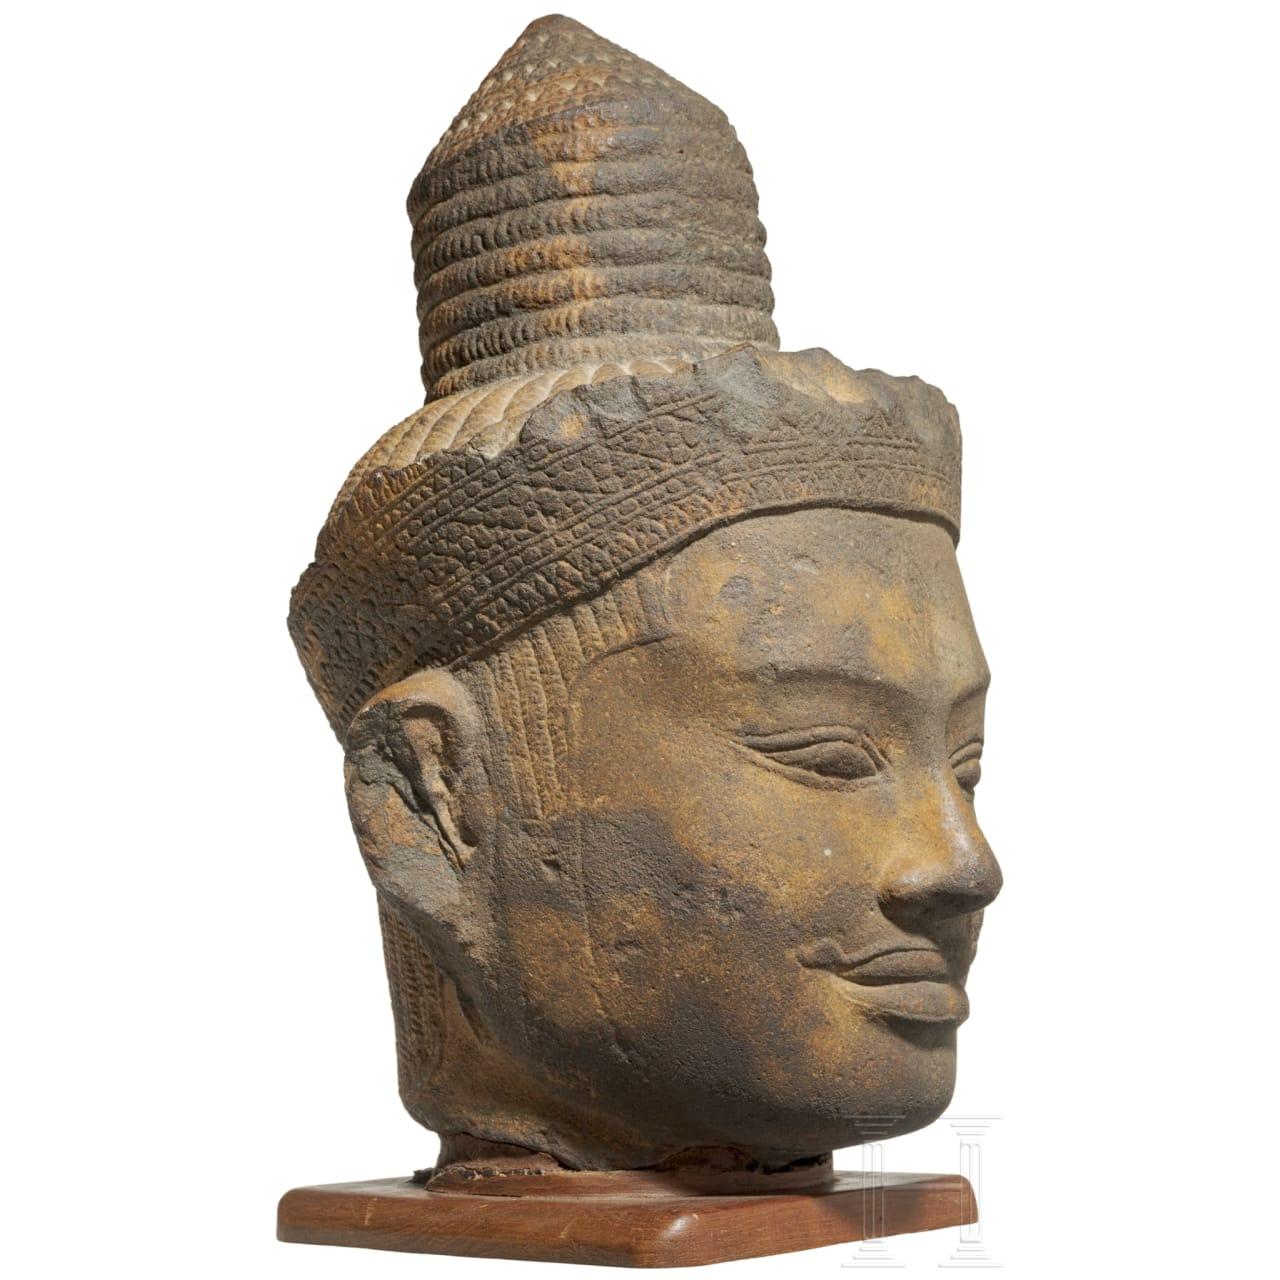 A Cambodian stone head of Shiva, Khmer culture, 11th/12th century